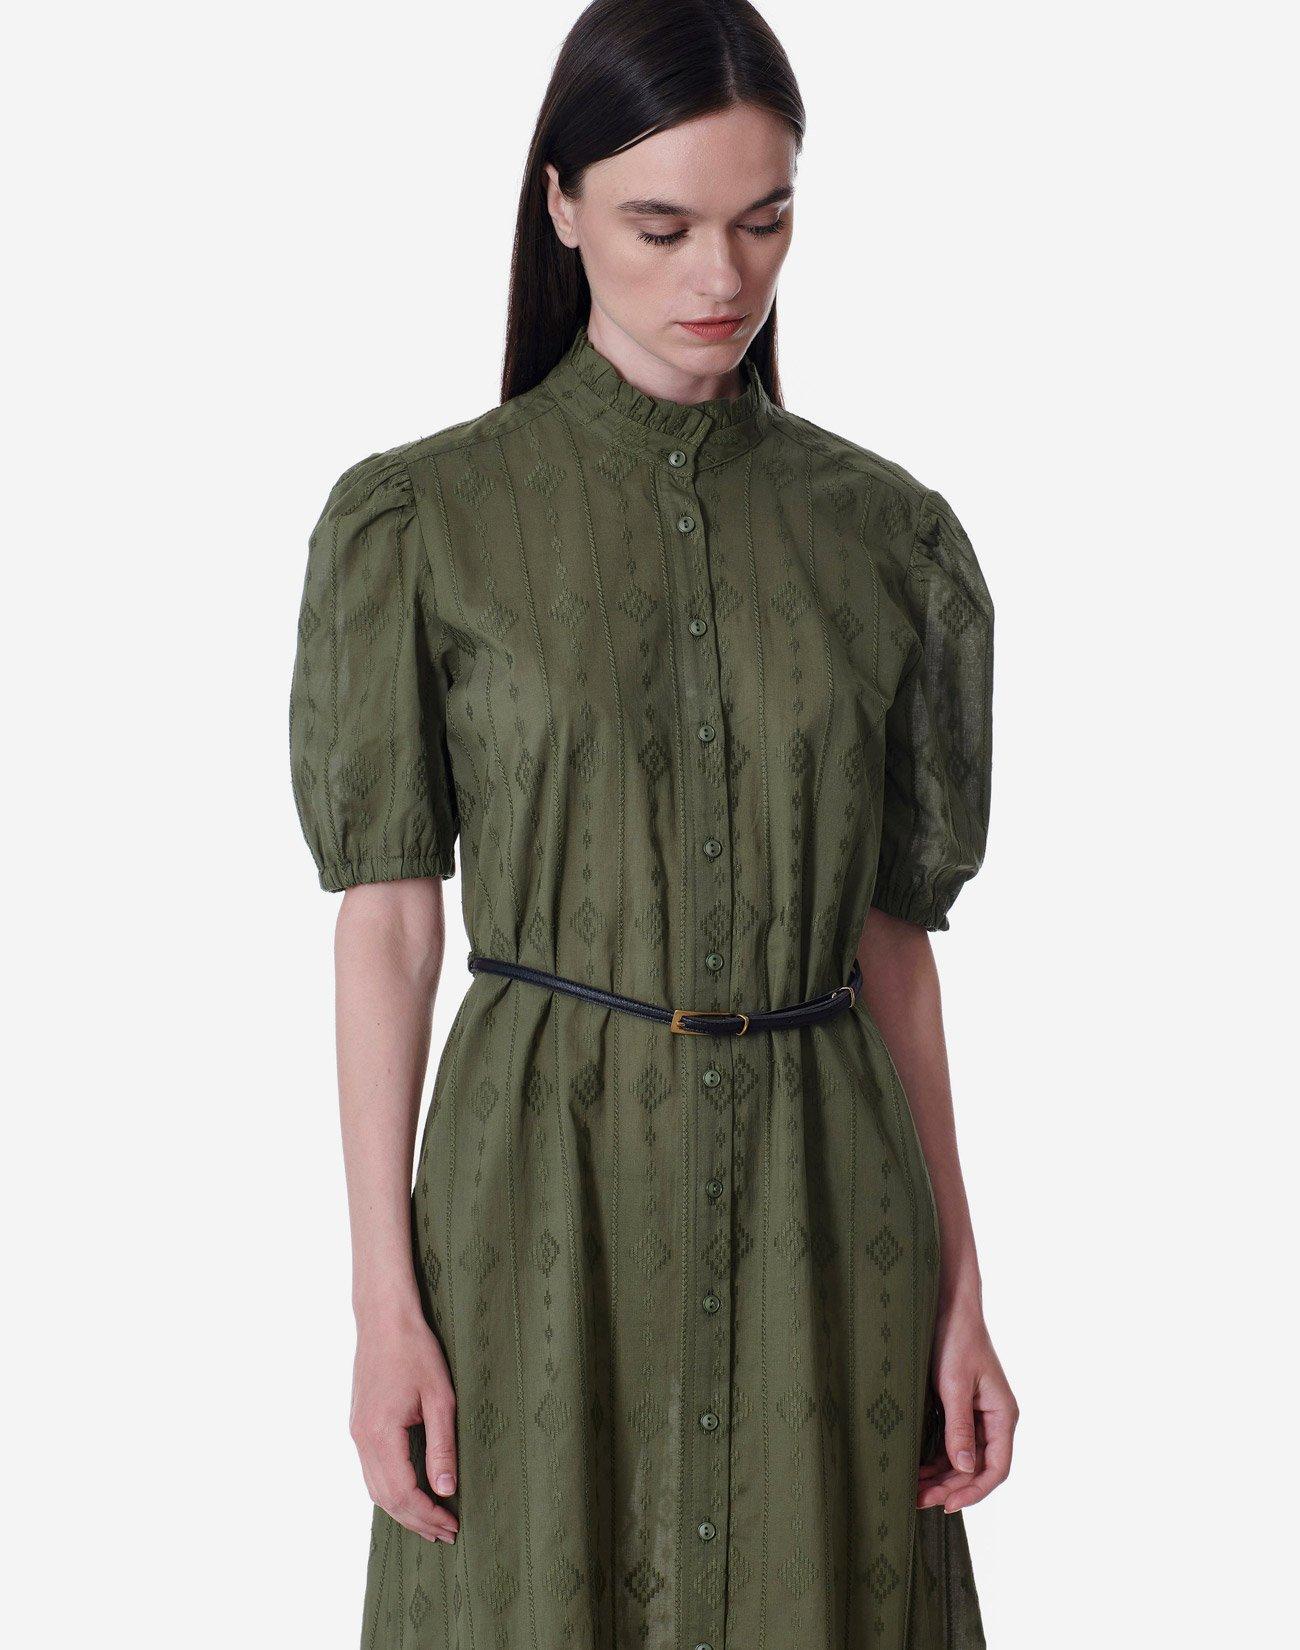 Midi dress with cutwork detail